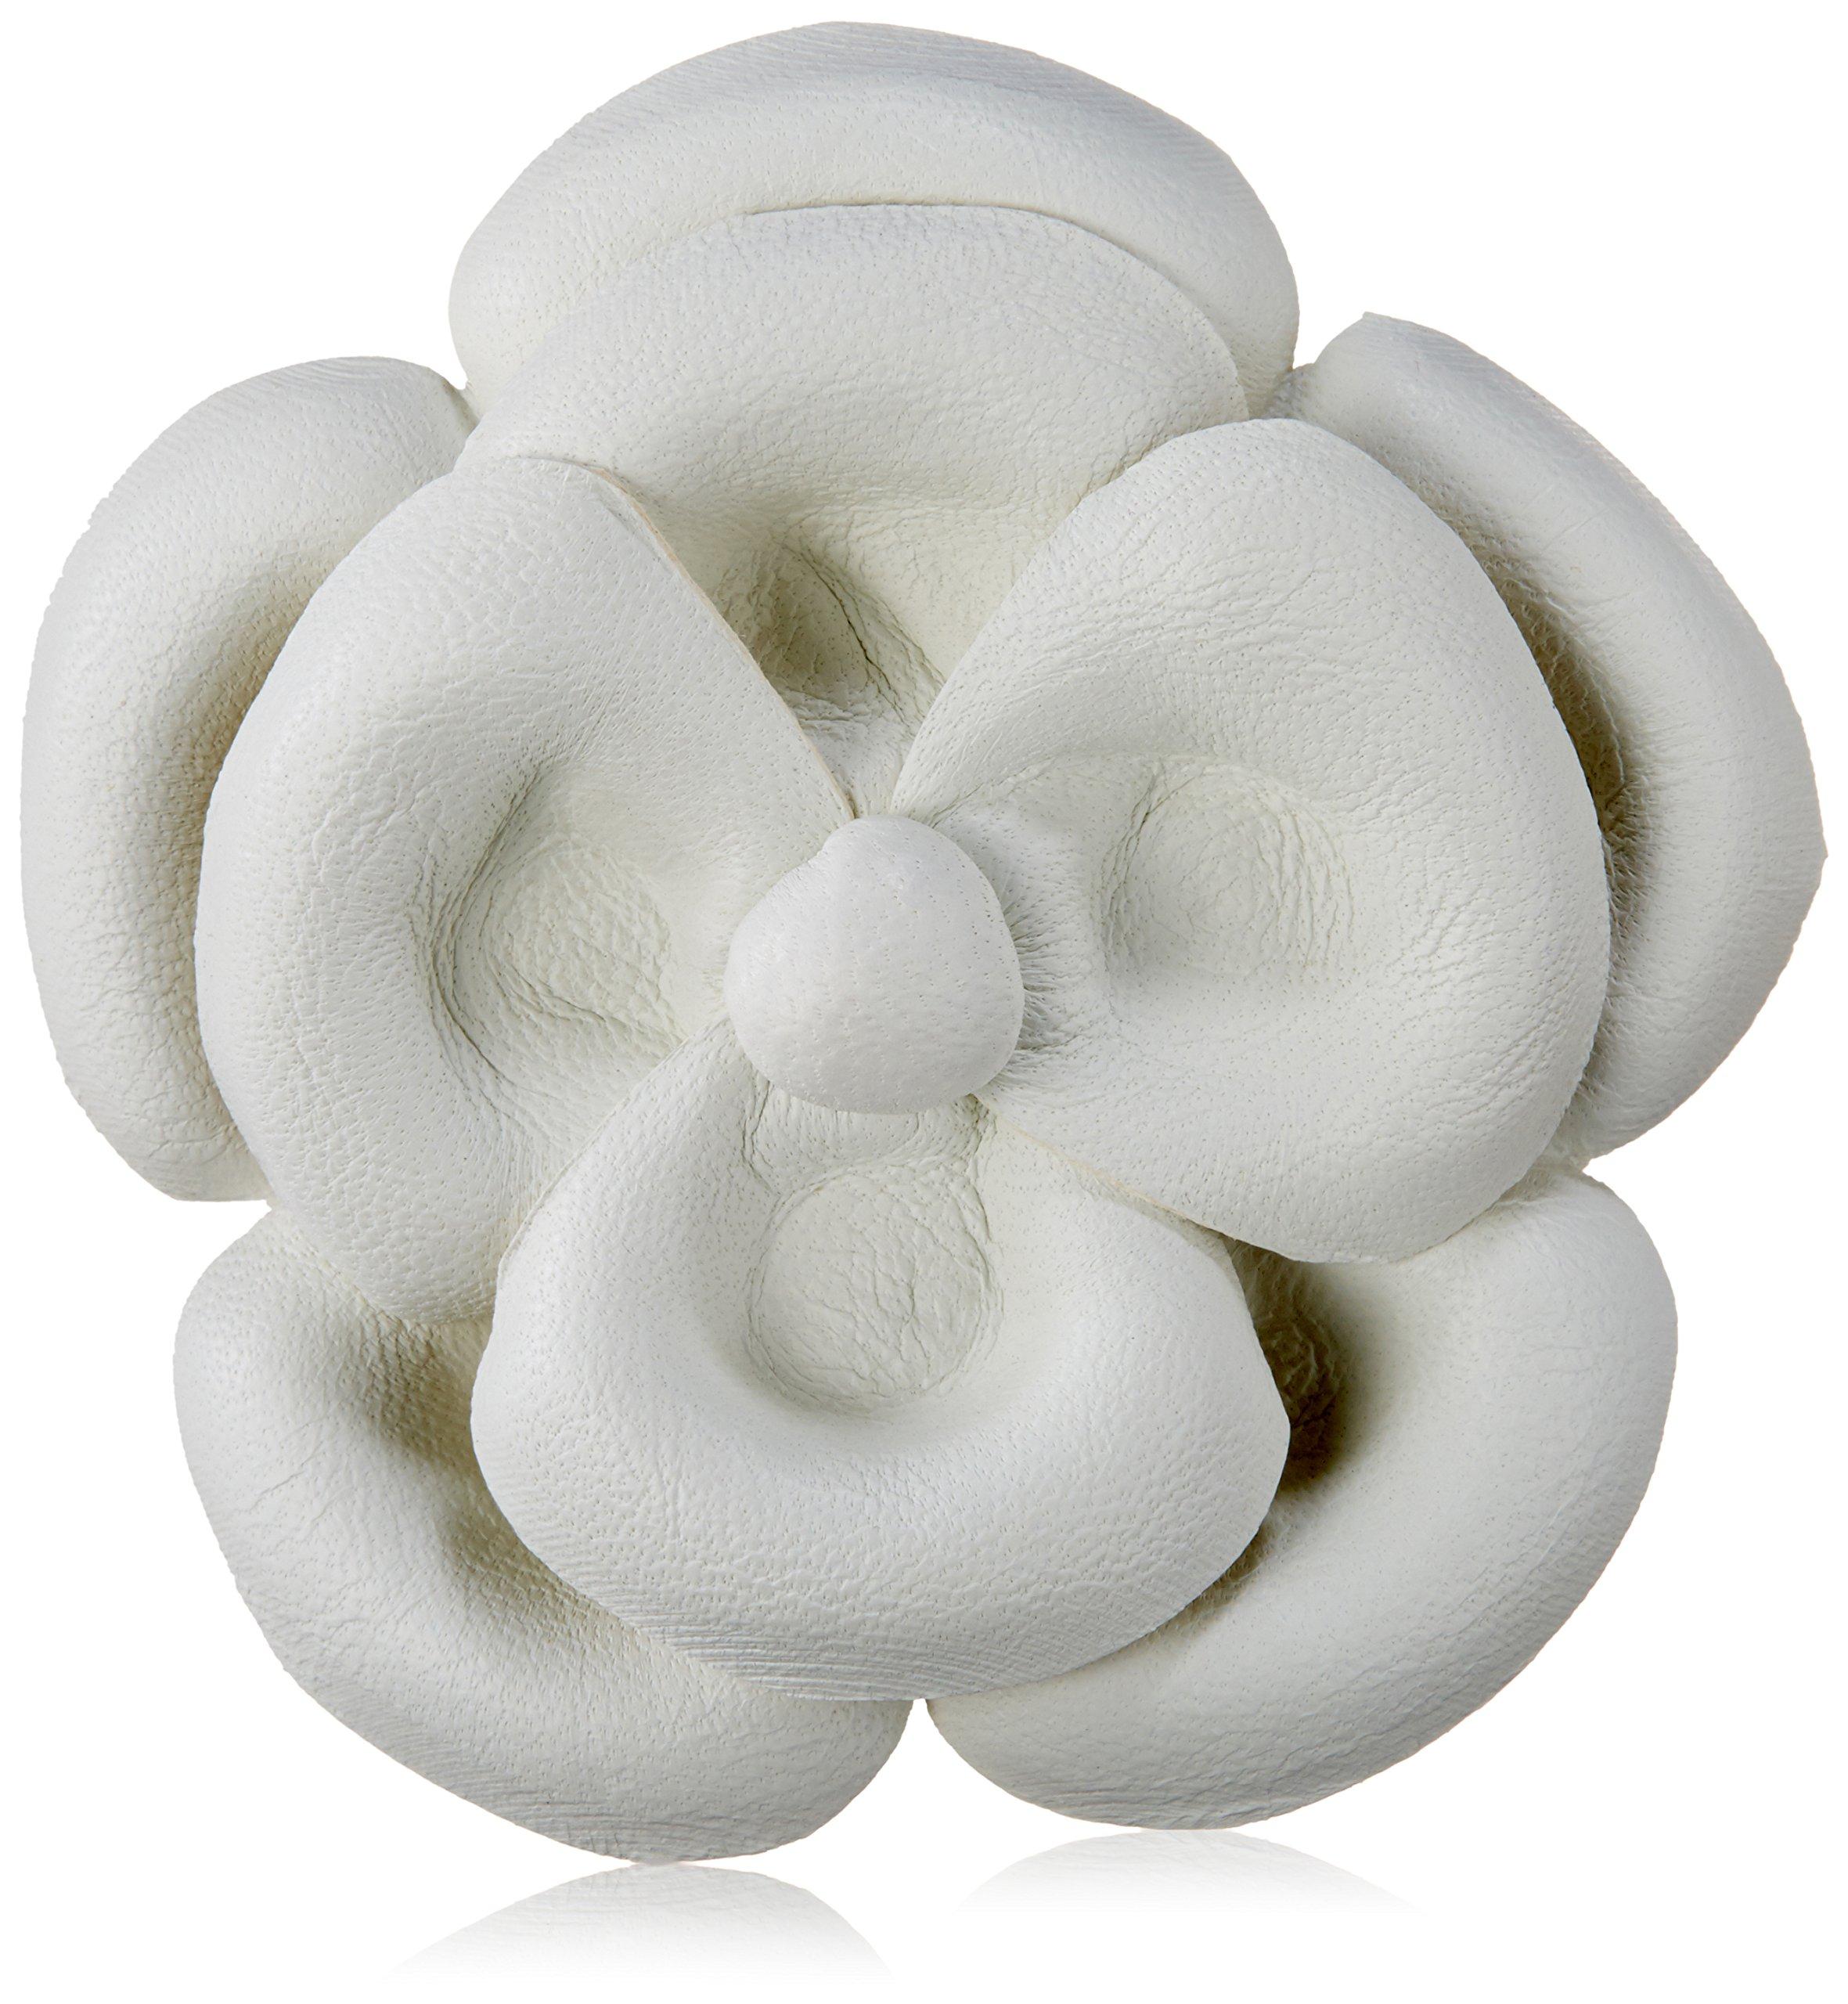 Emi Jay Leather Camellia Barrette, White